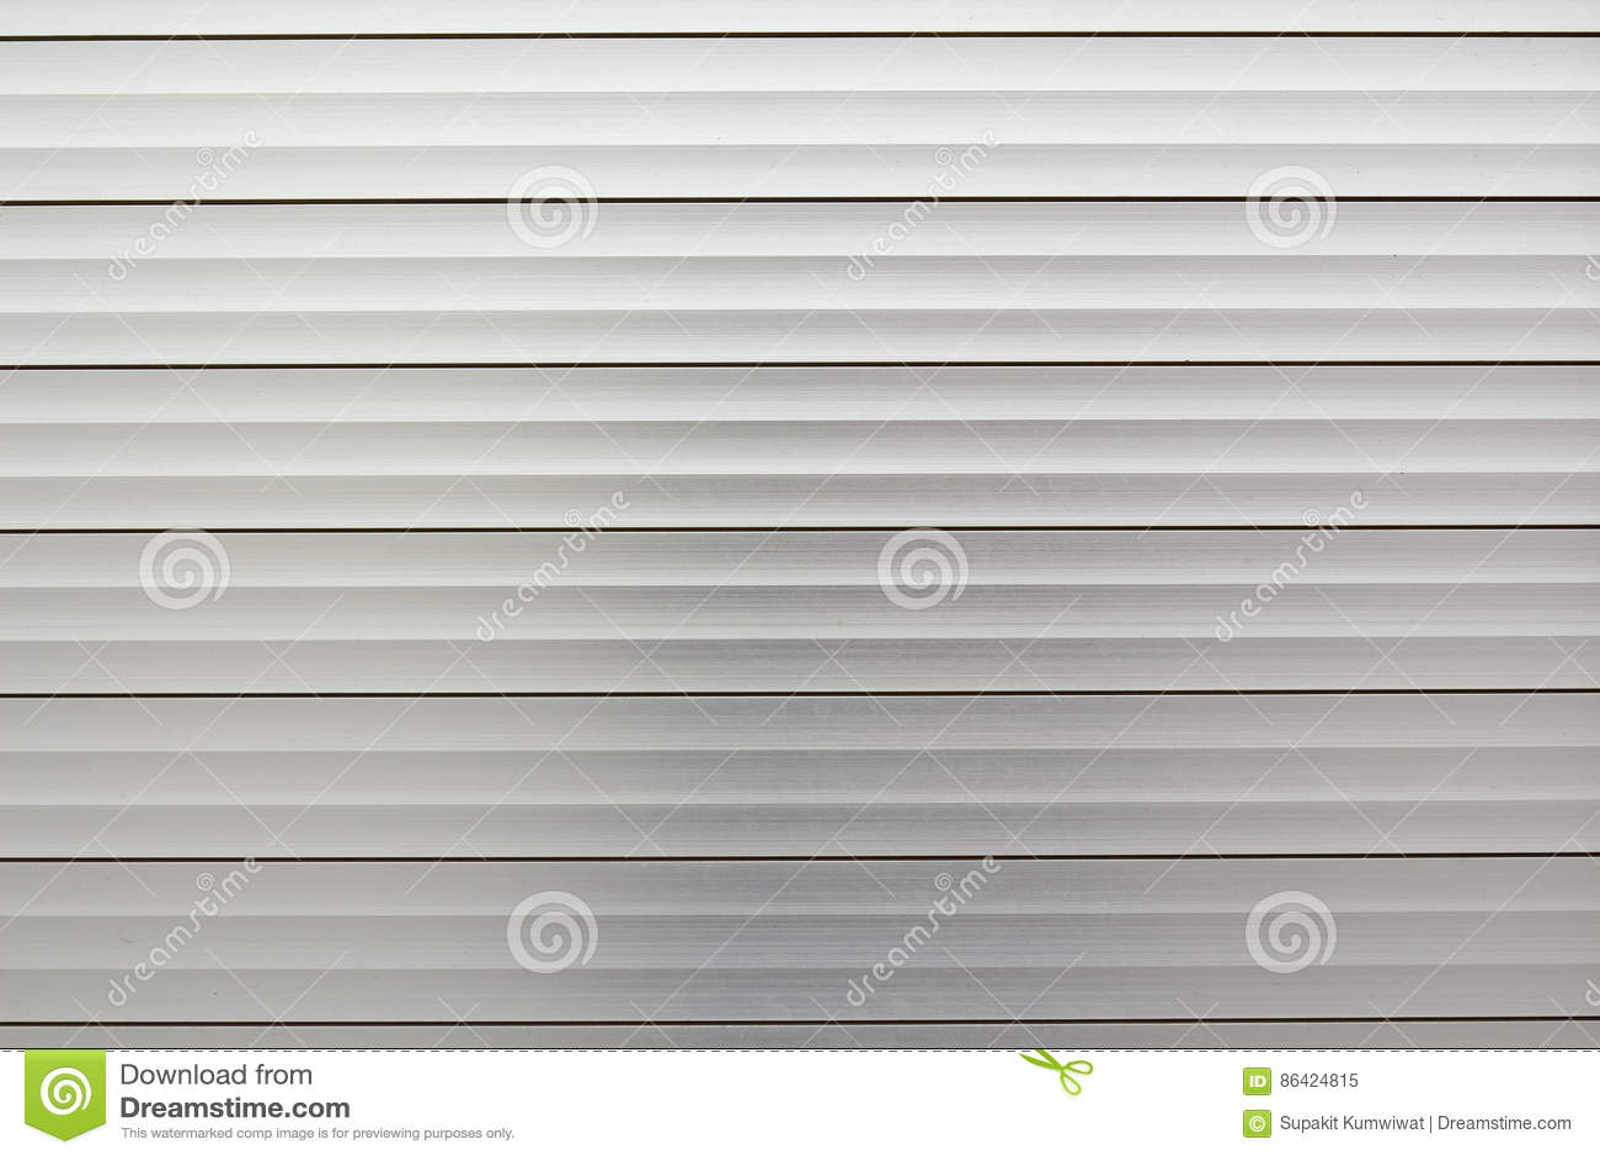 Papier Peint Horizontal Gris De Texture De Feuillard Image Stock